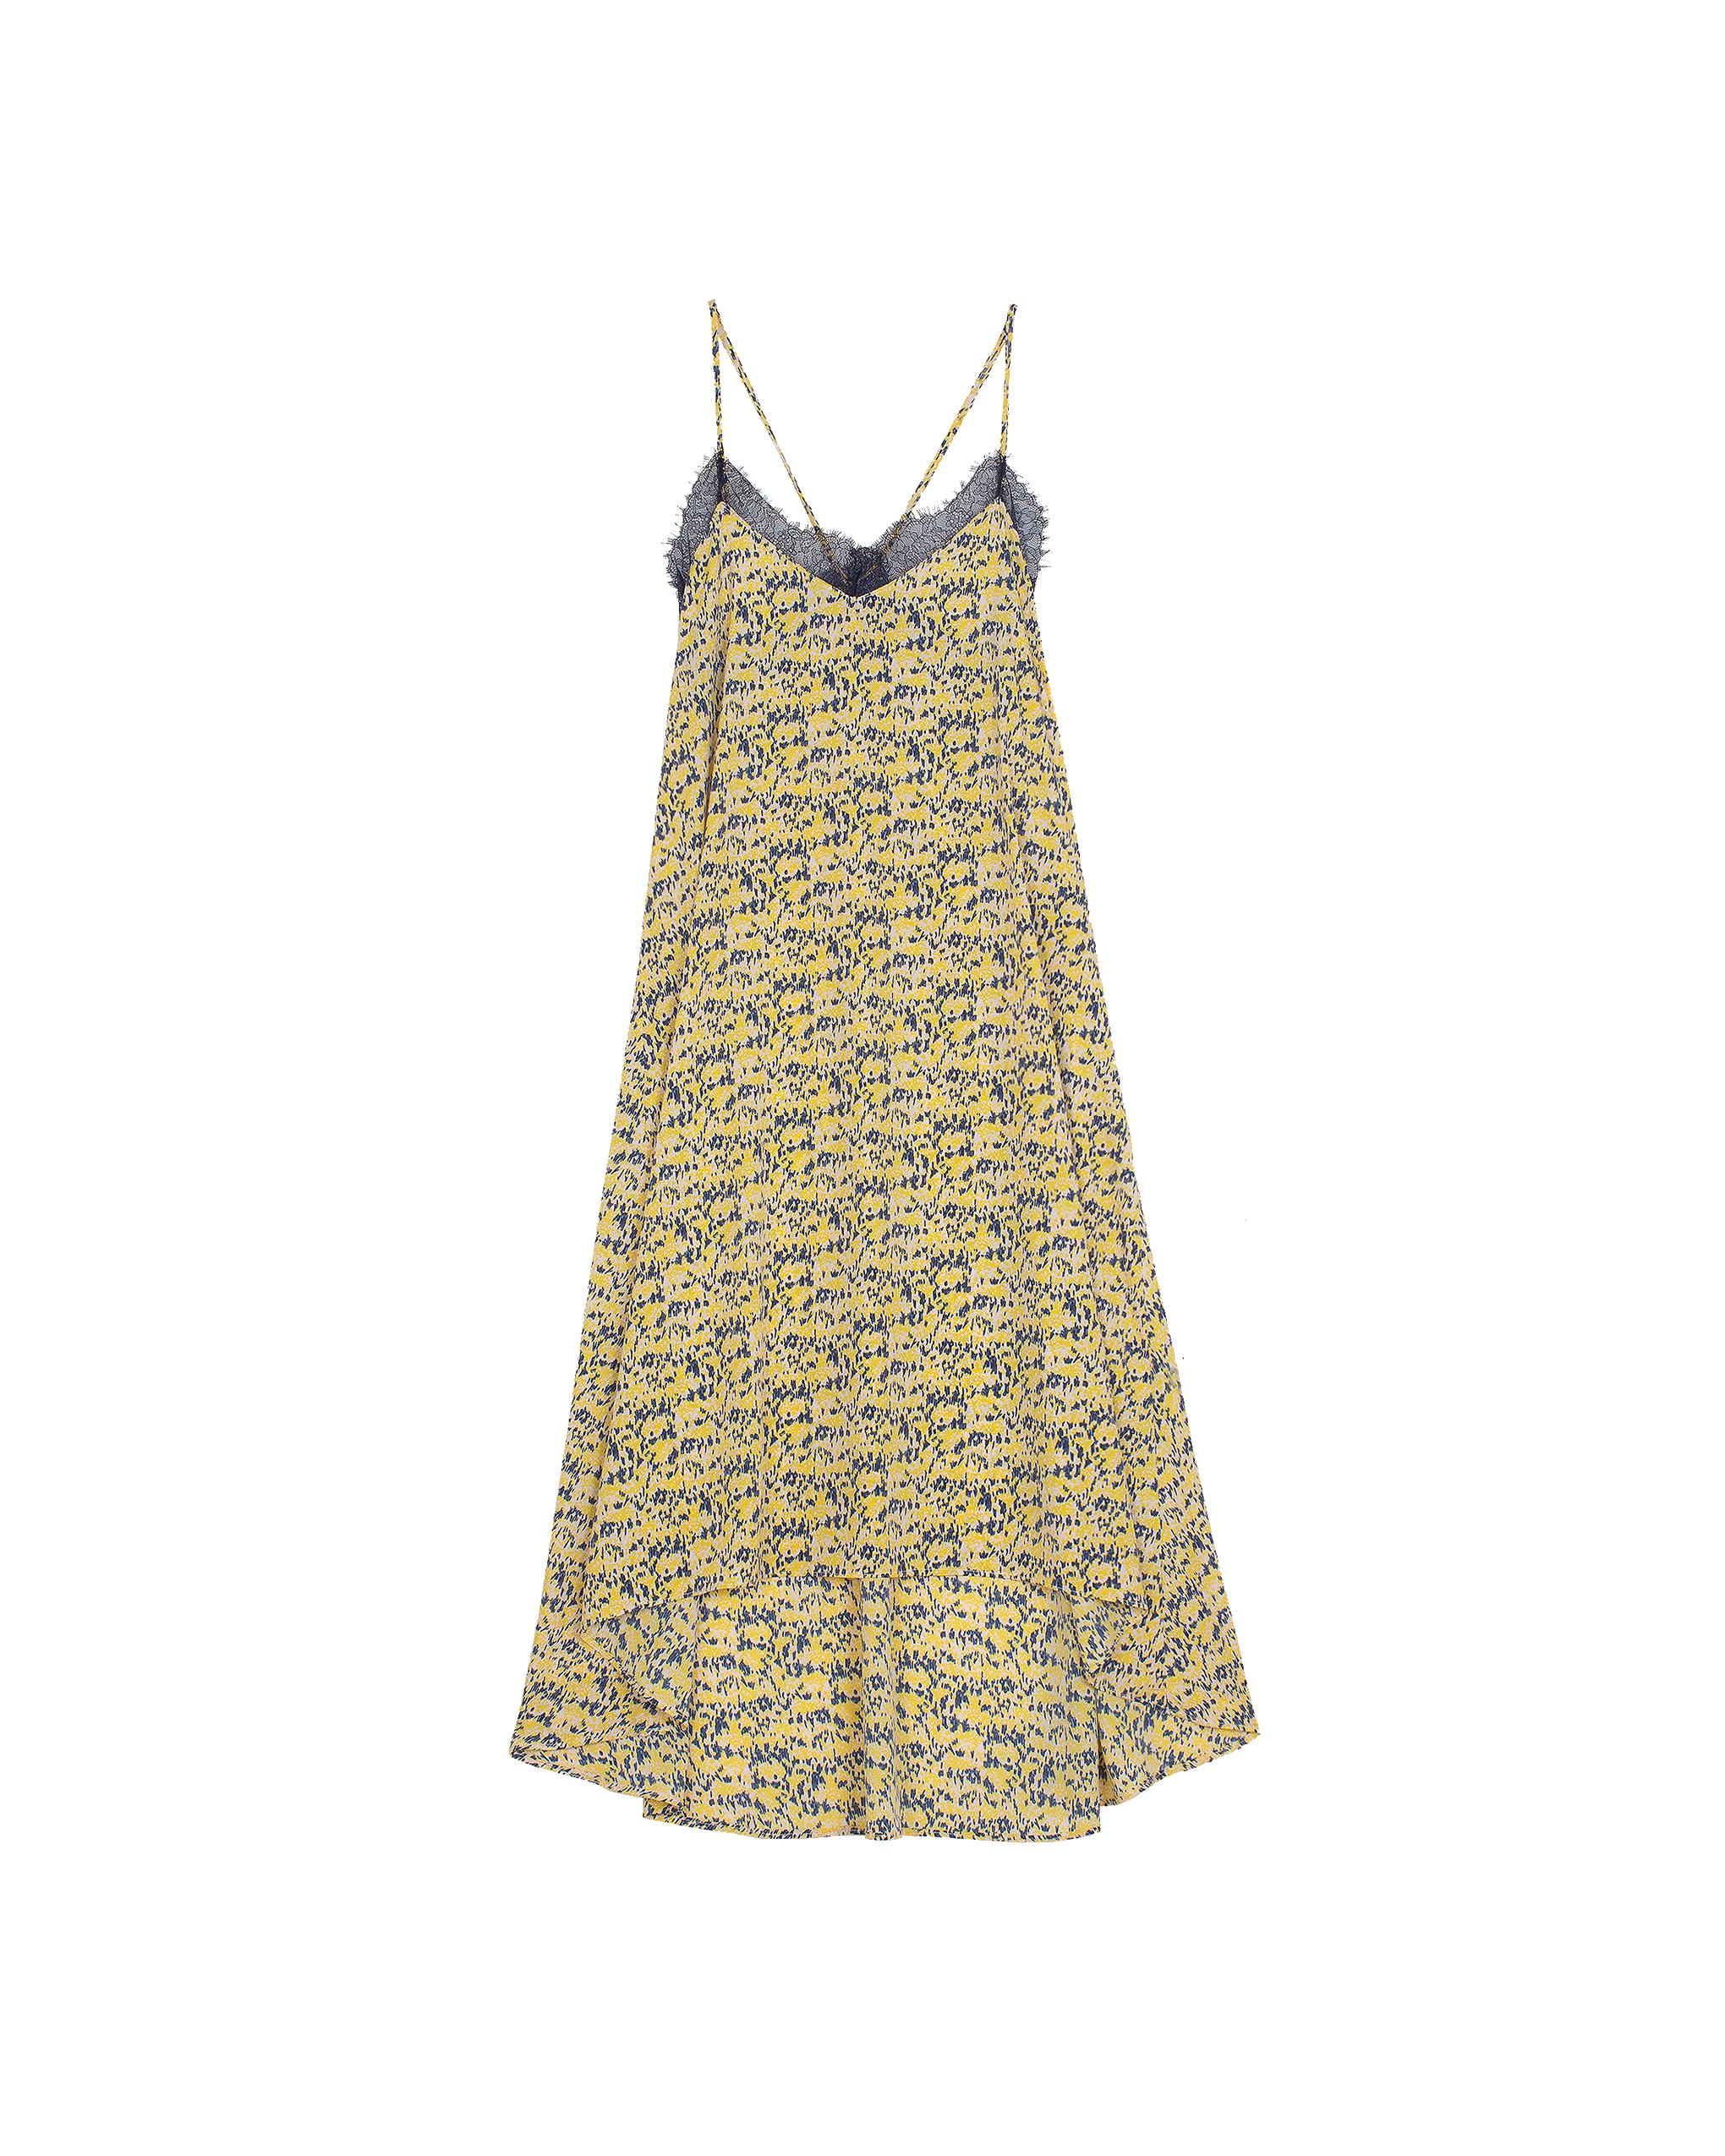 EMIN + PAUL yellow print strappy dress.